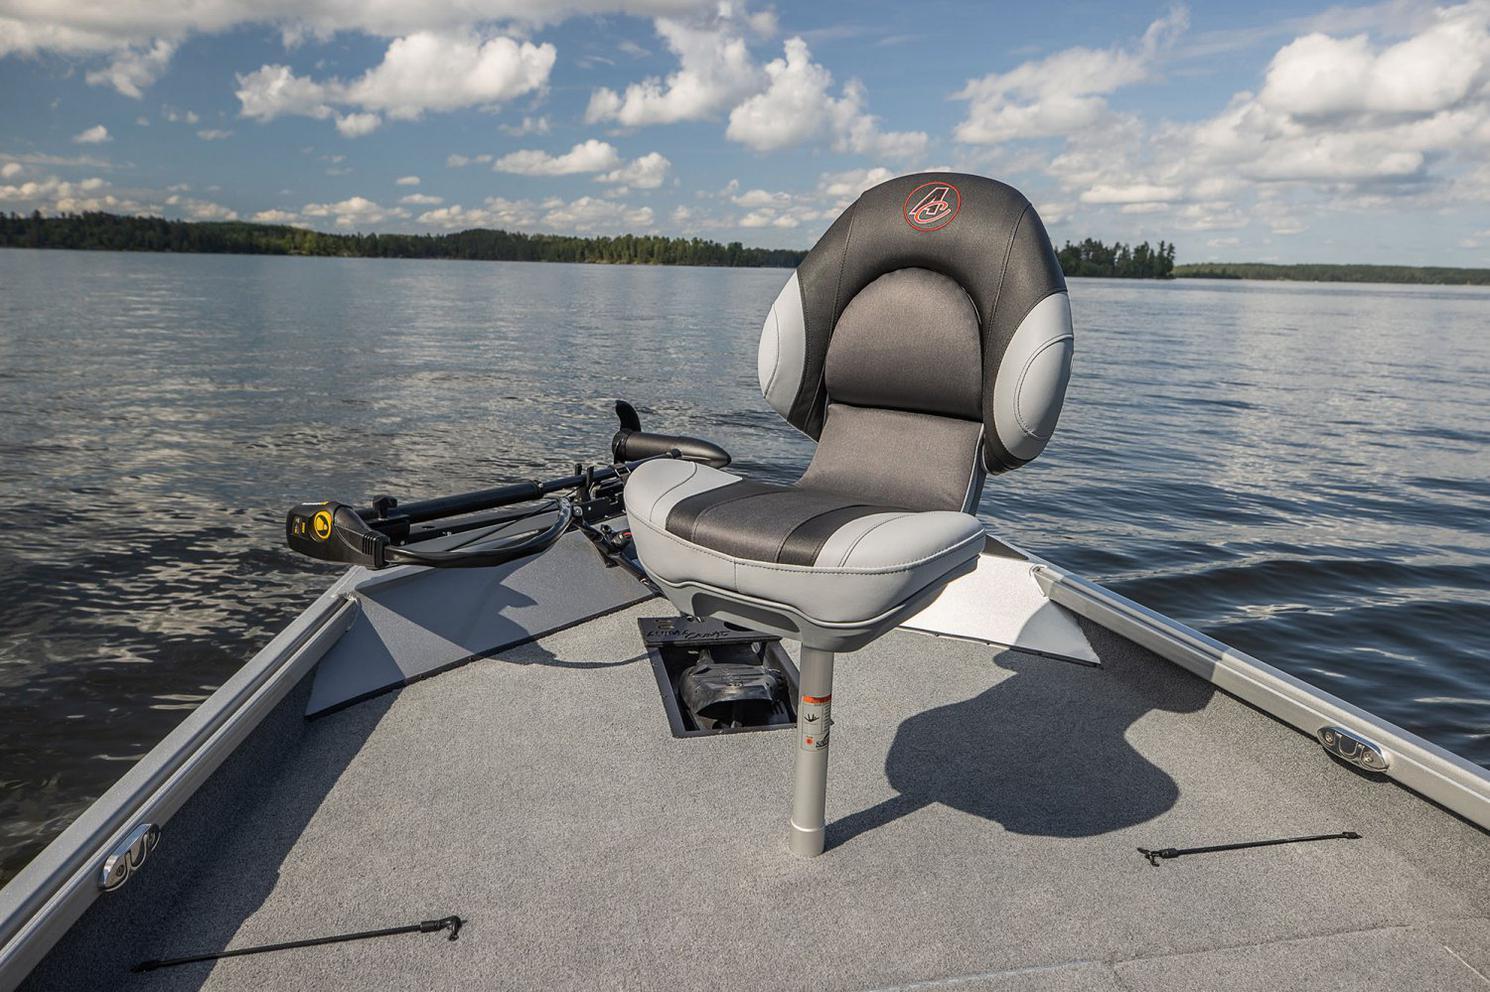 2021 Alumacraft boat for sale, model of the boat is Alumacraft Pro Series 185 & Image # 8 of 8